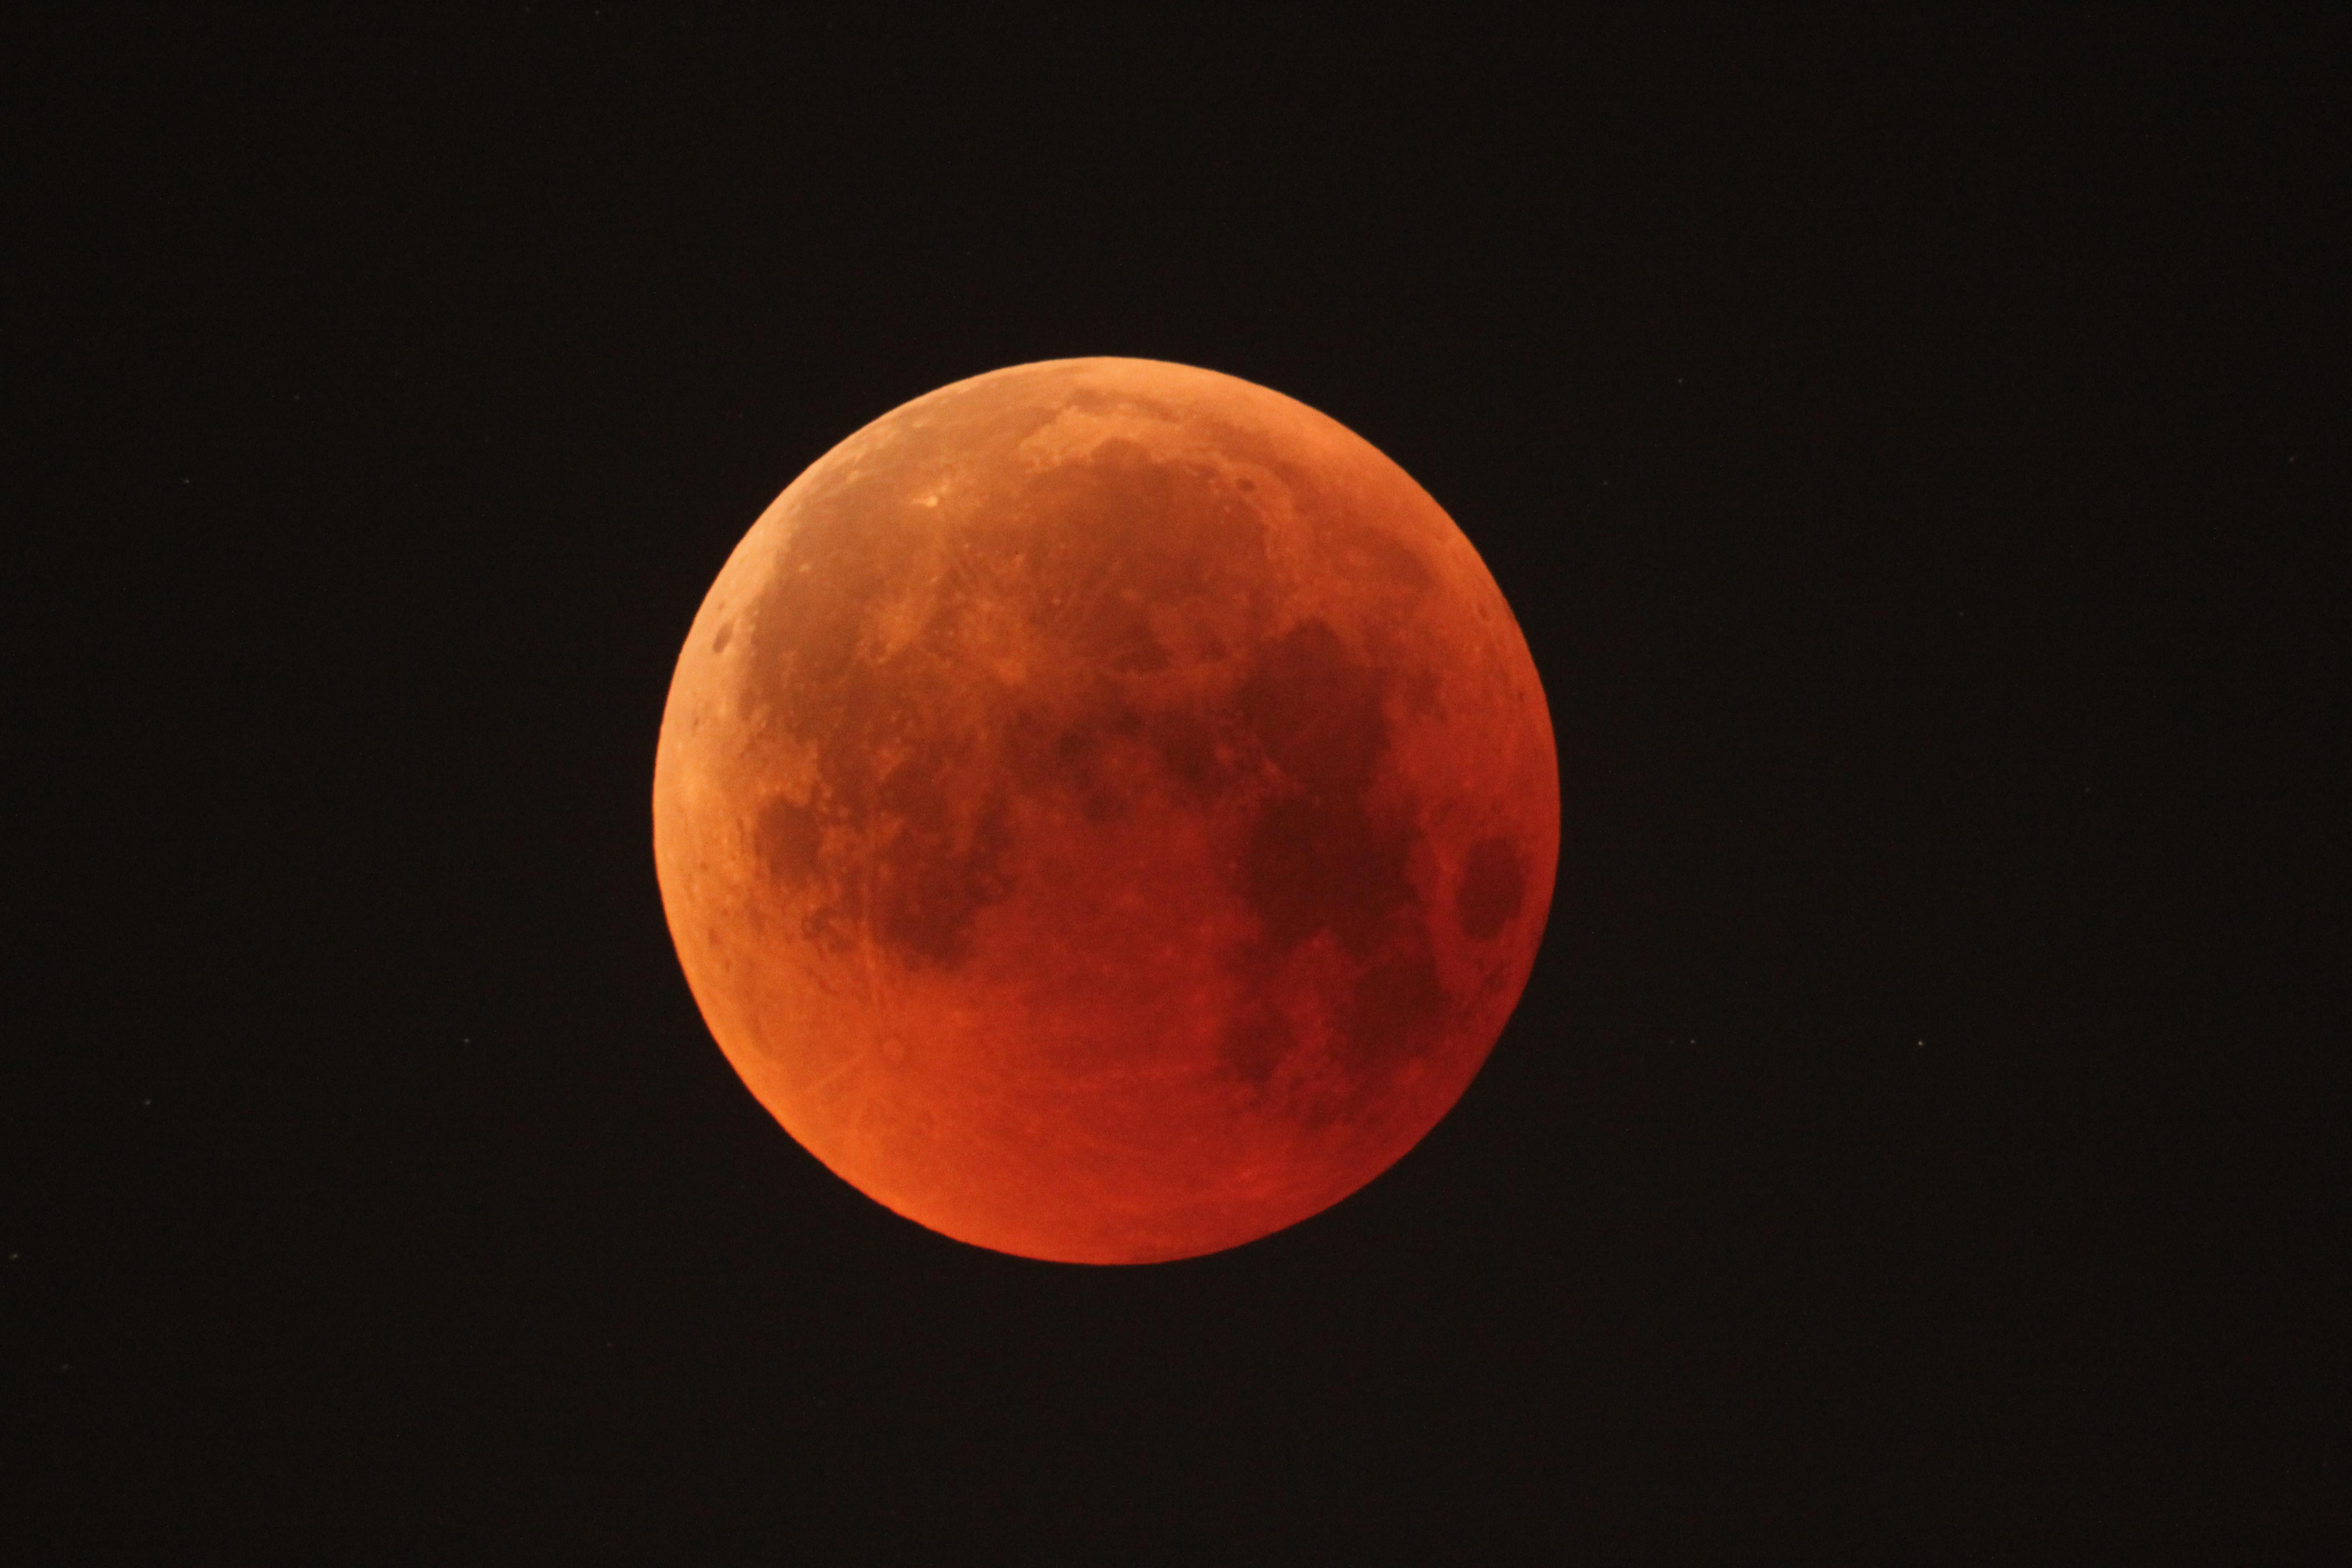 red moon july 2018 las vegas - photo #37